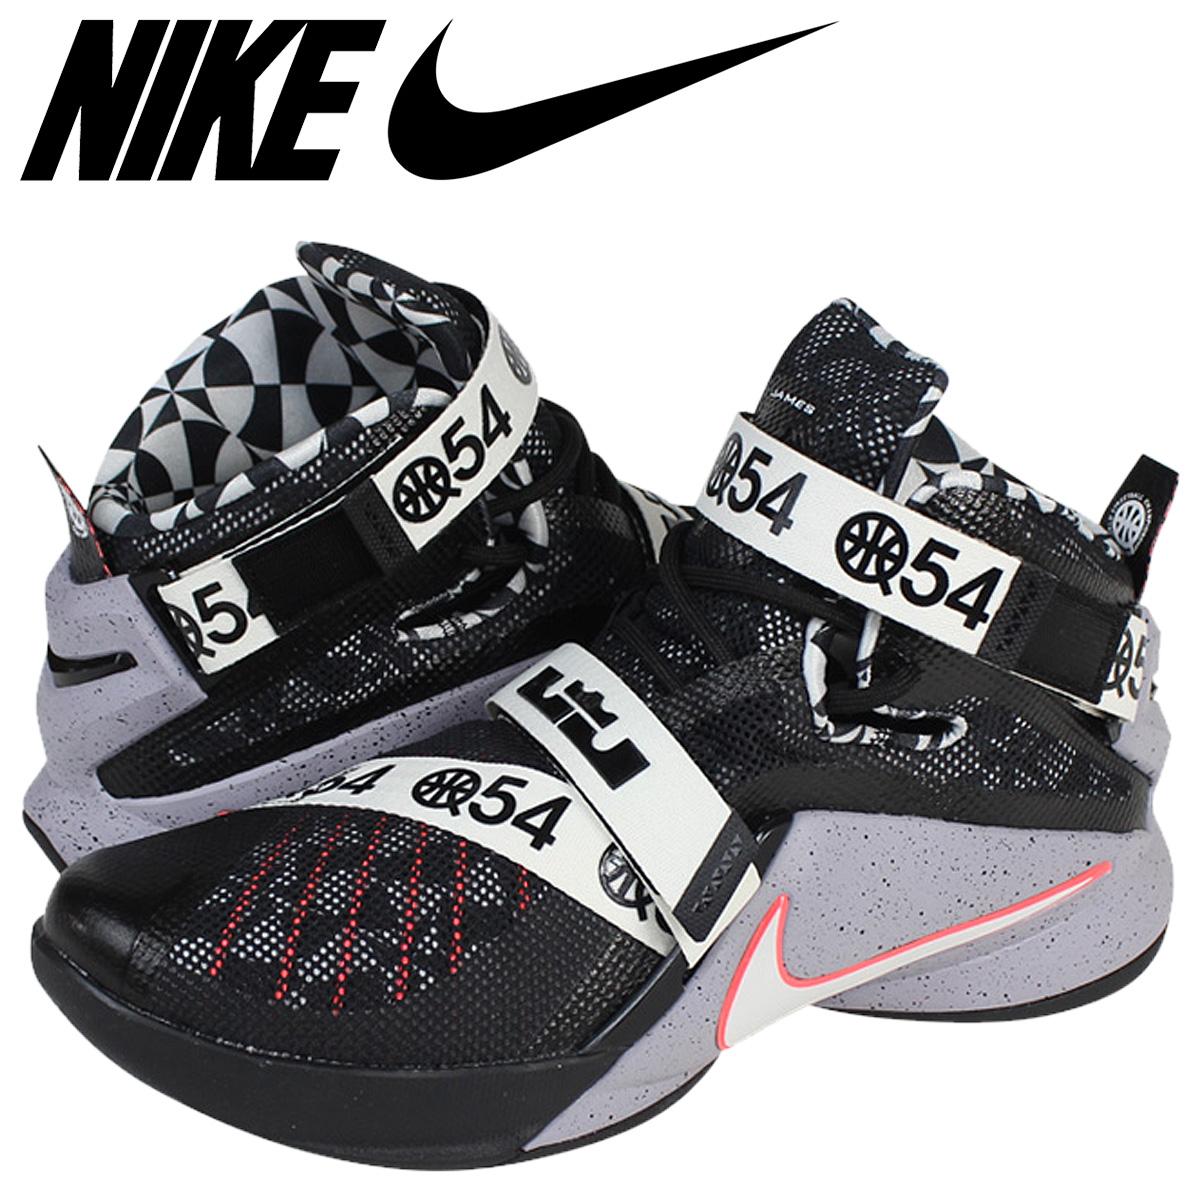 buy popular 9413c f10a7 NIKE Nike LeBron soldier sneakers LEBRON SOLDIER IX LMTD QUAI 54 limited  Quai 54 810803-015 grey men